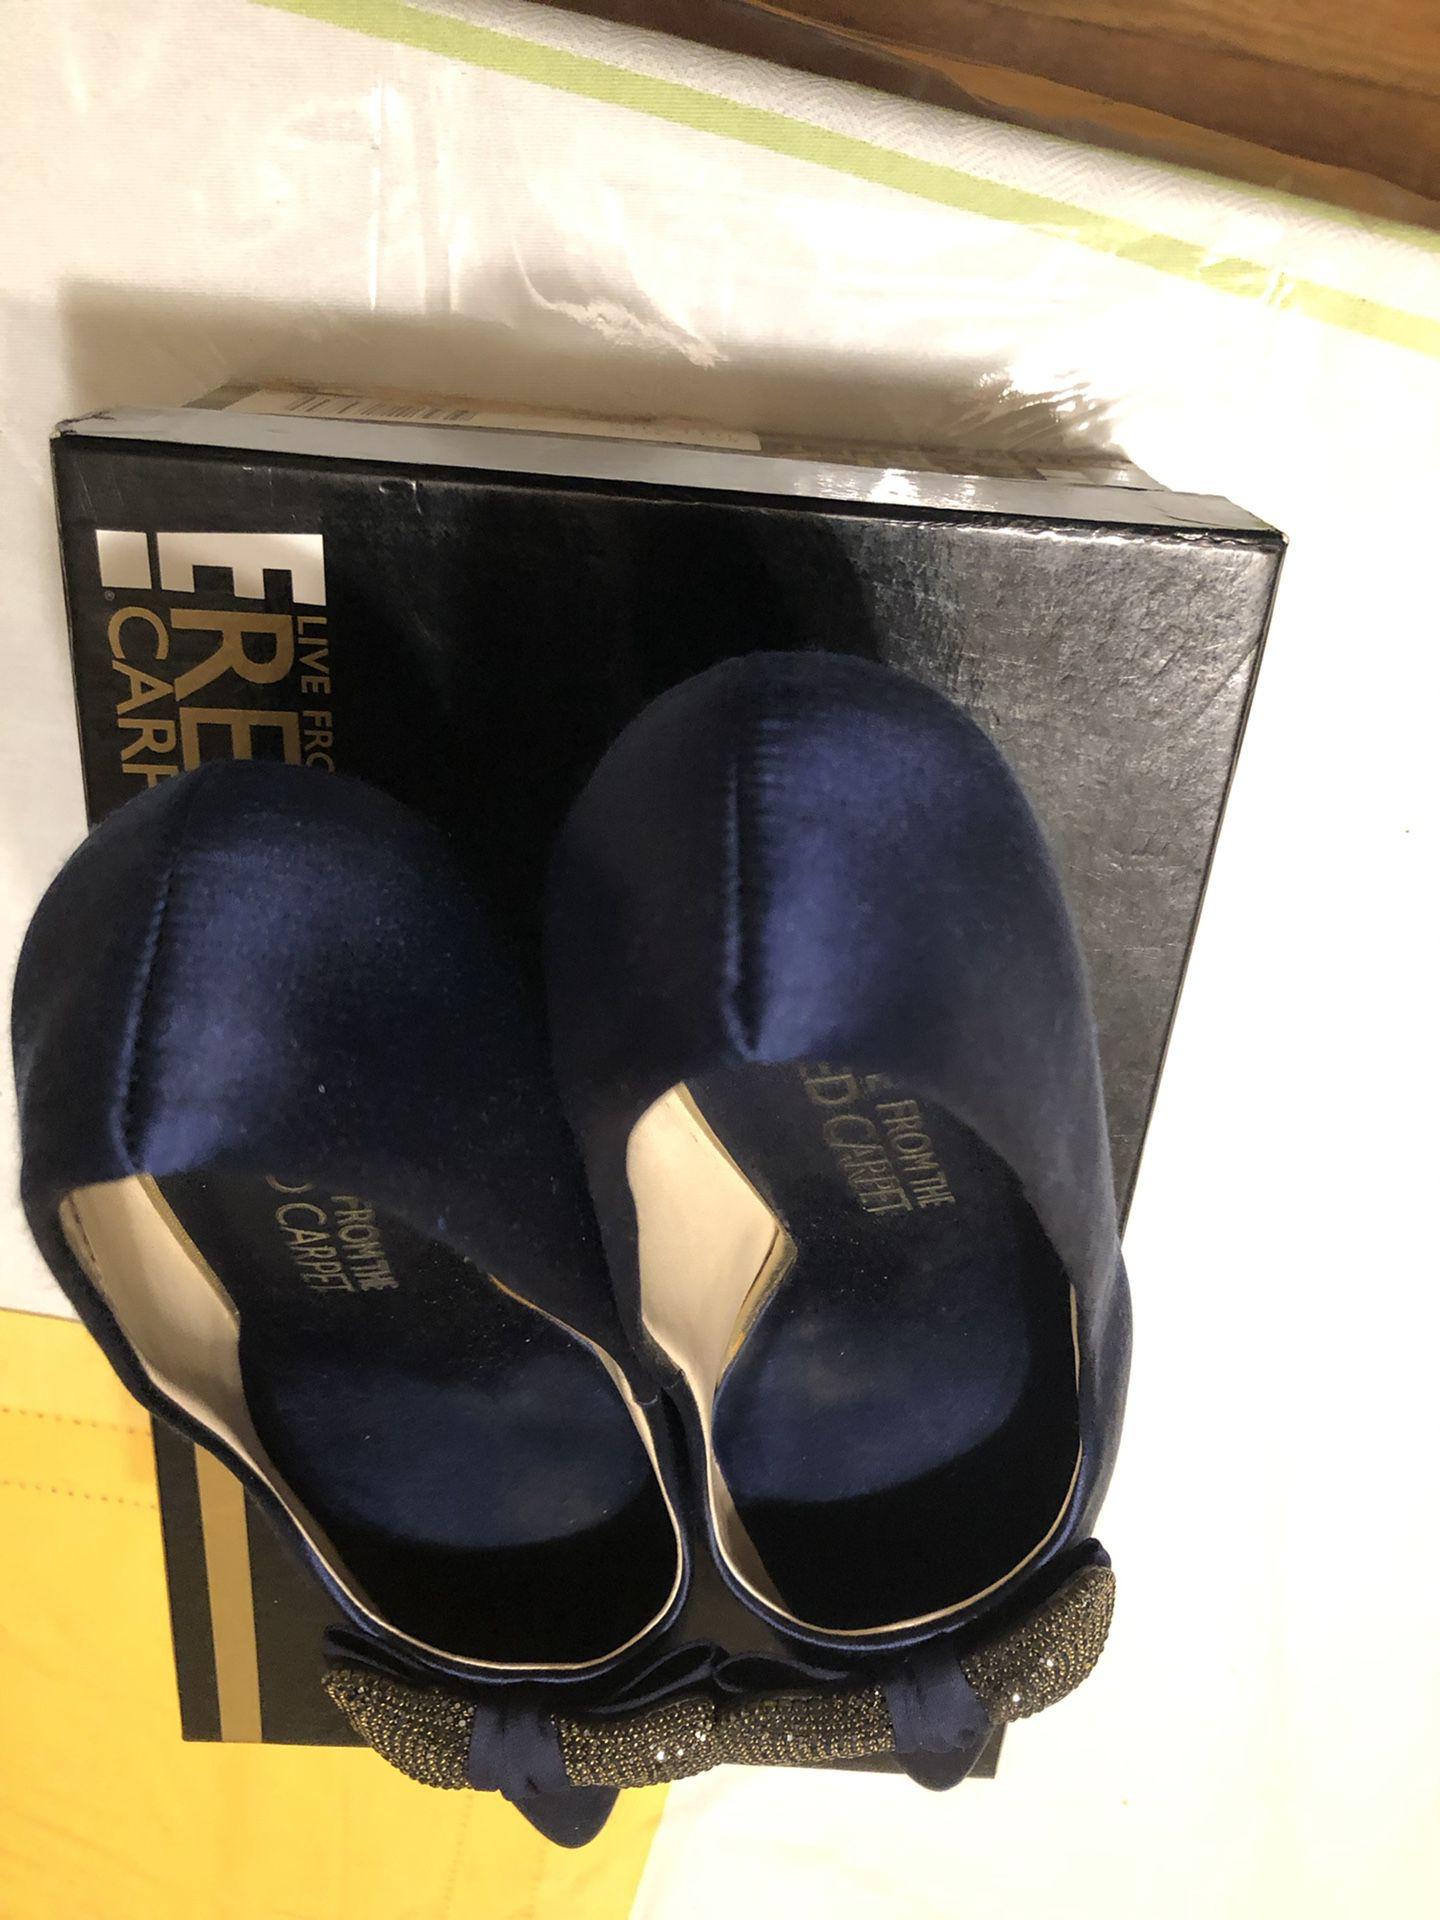 Red Carpet navy blue ladies dress shoes size 10 M